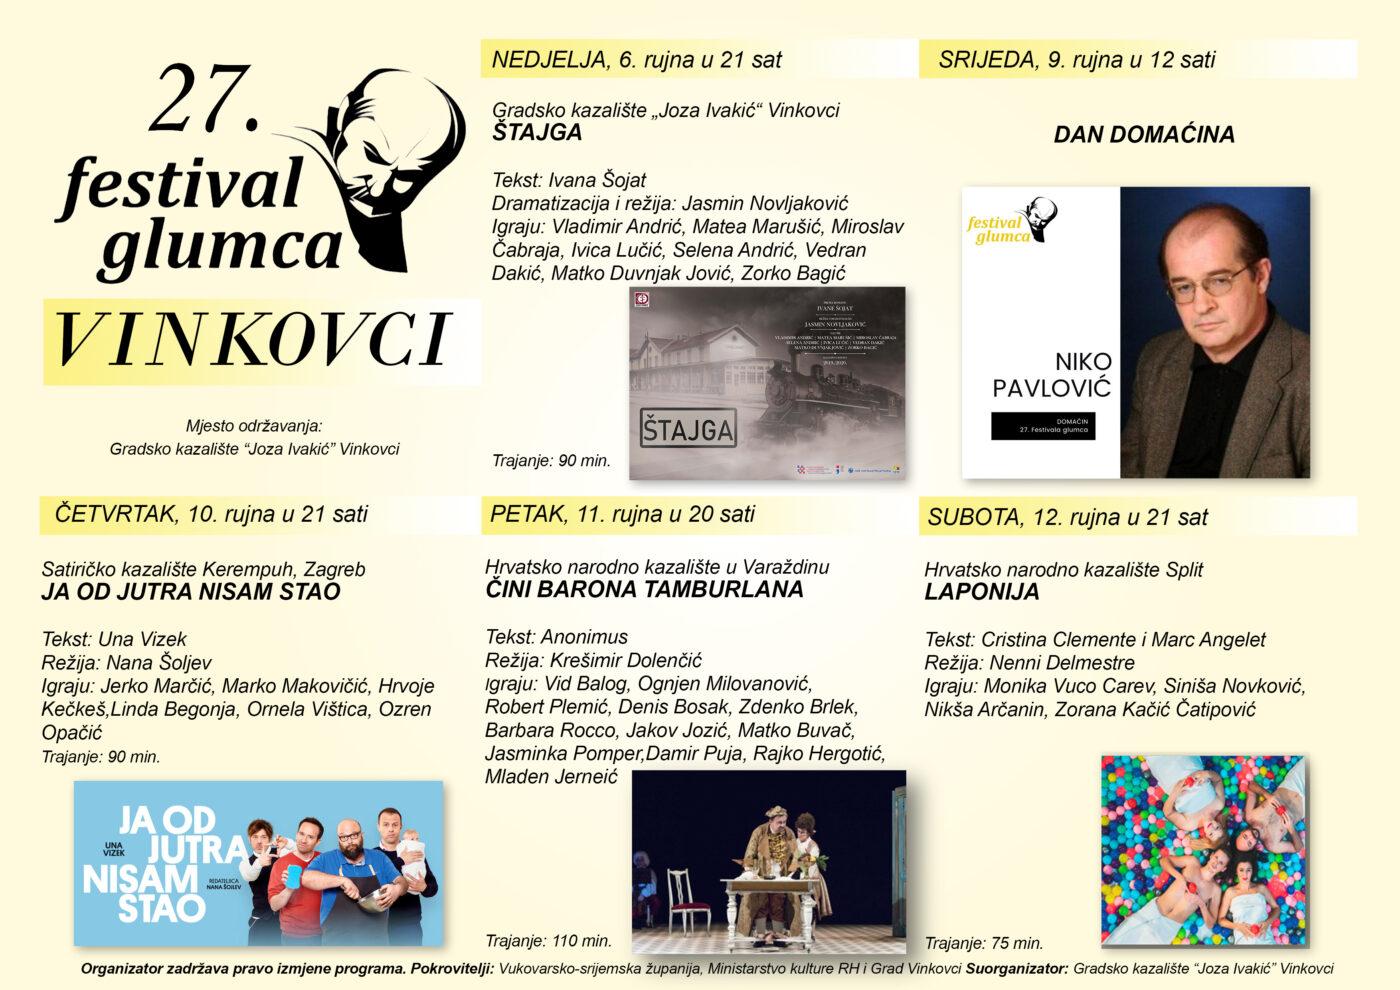 27. Festival glumca, Vinkovci